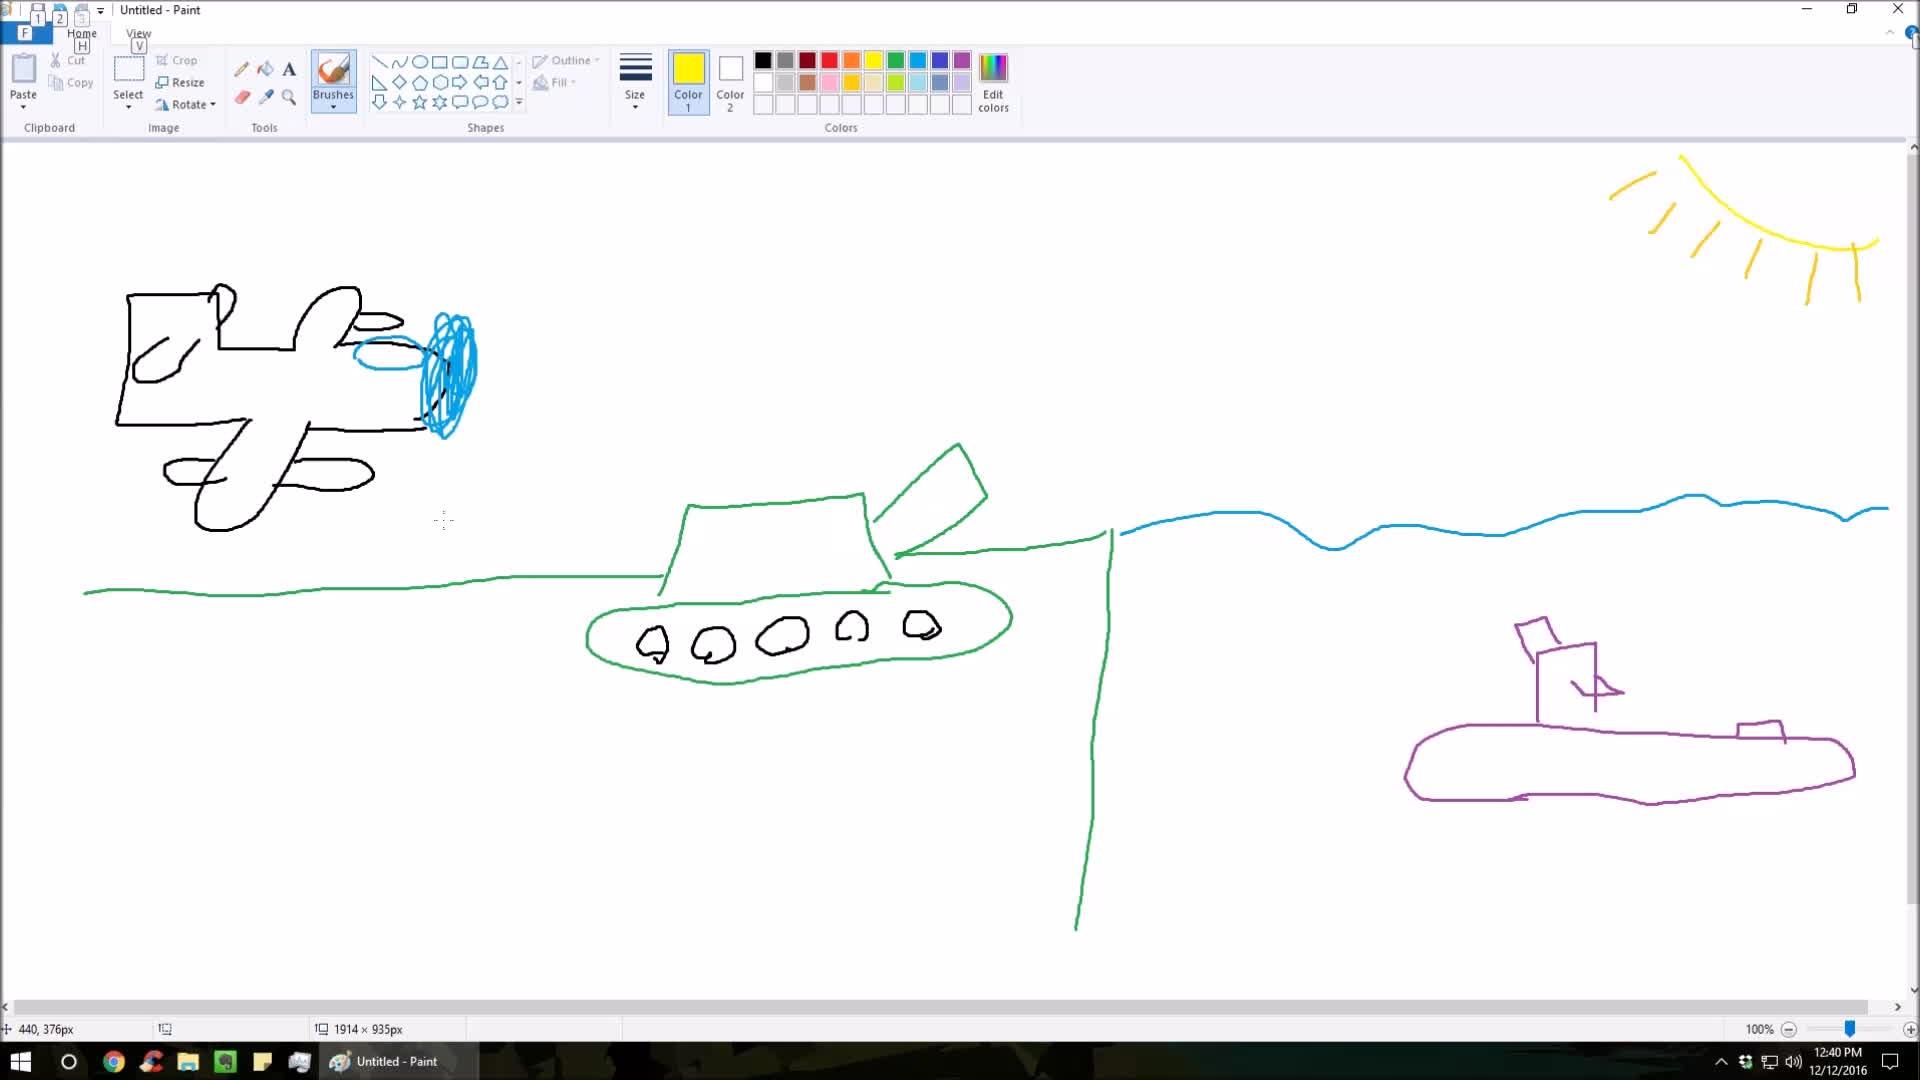 civ, Jet vs Submarine (reddit) GIFs